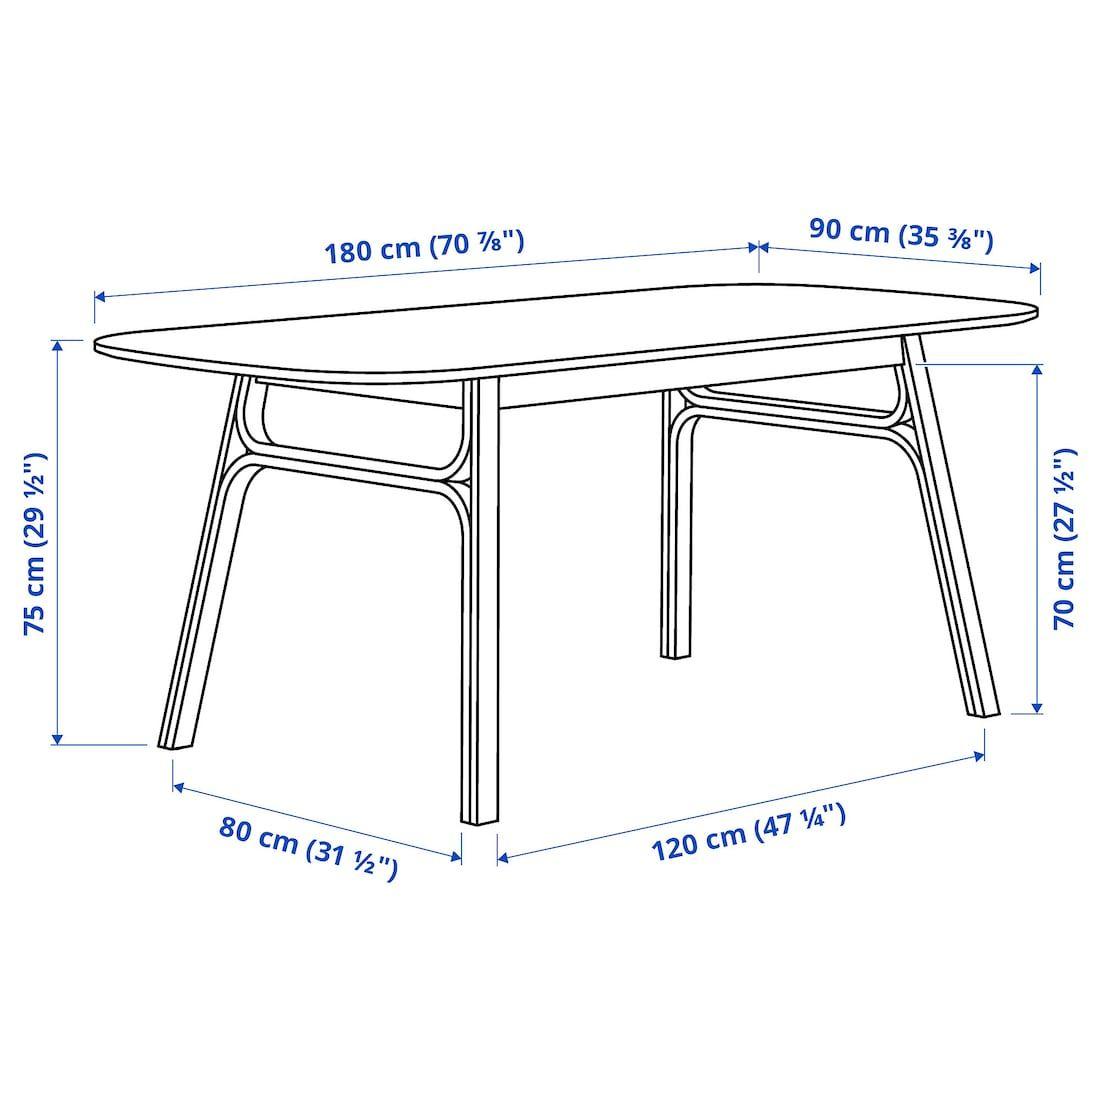 Voxlov Dining Table Light Bamboo 707 8x353 8 Ikea Dining Table Light Dining Table Ikea [ 1100 x 1100 Pixel ]